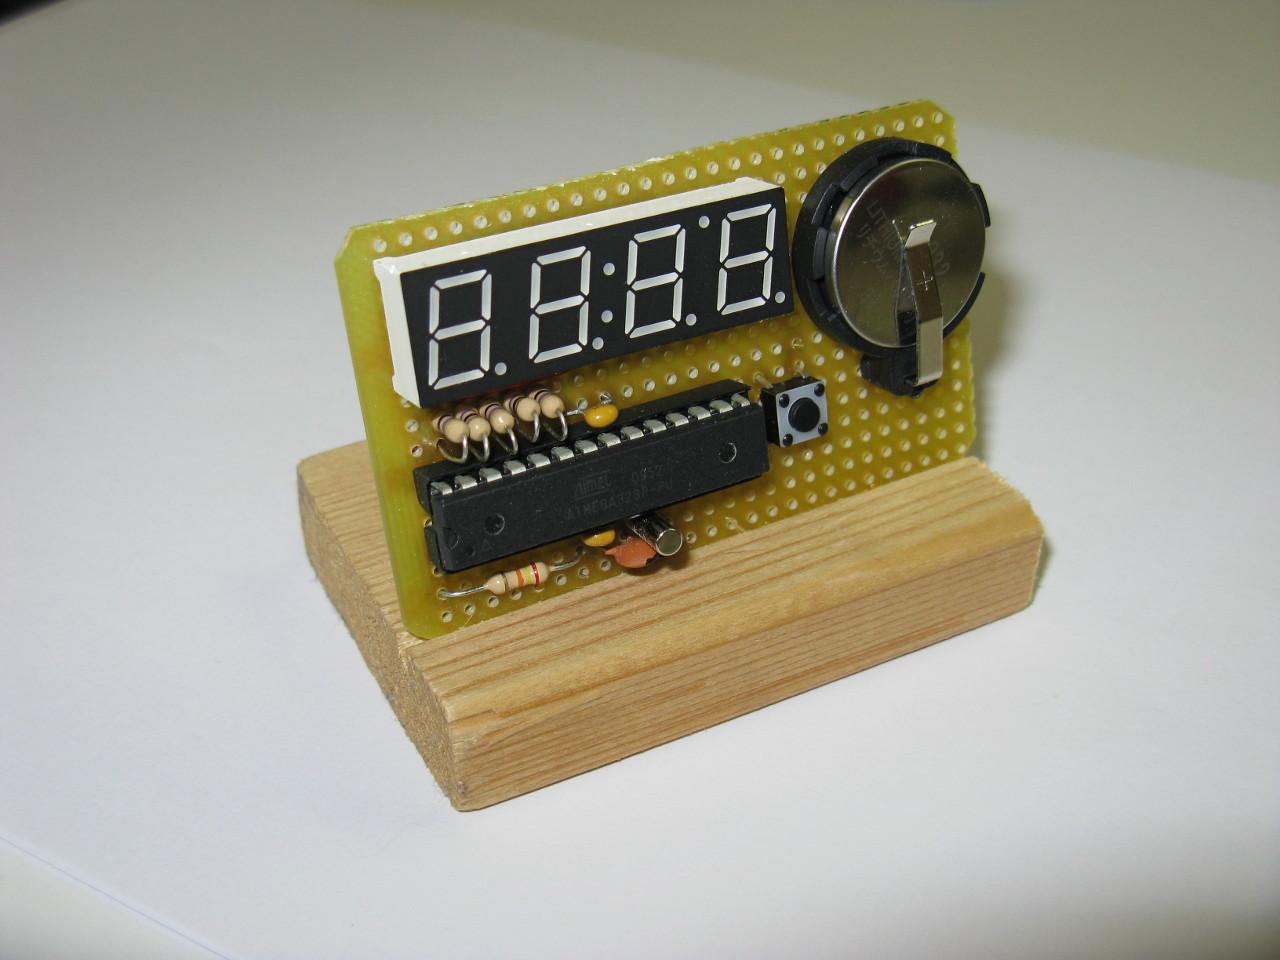 Micrologio, a micro-watch based on an Atmega328P